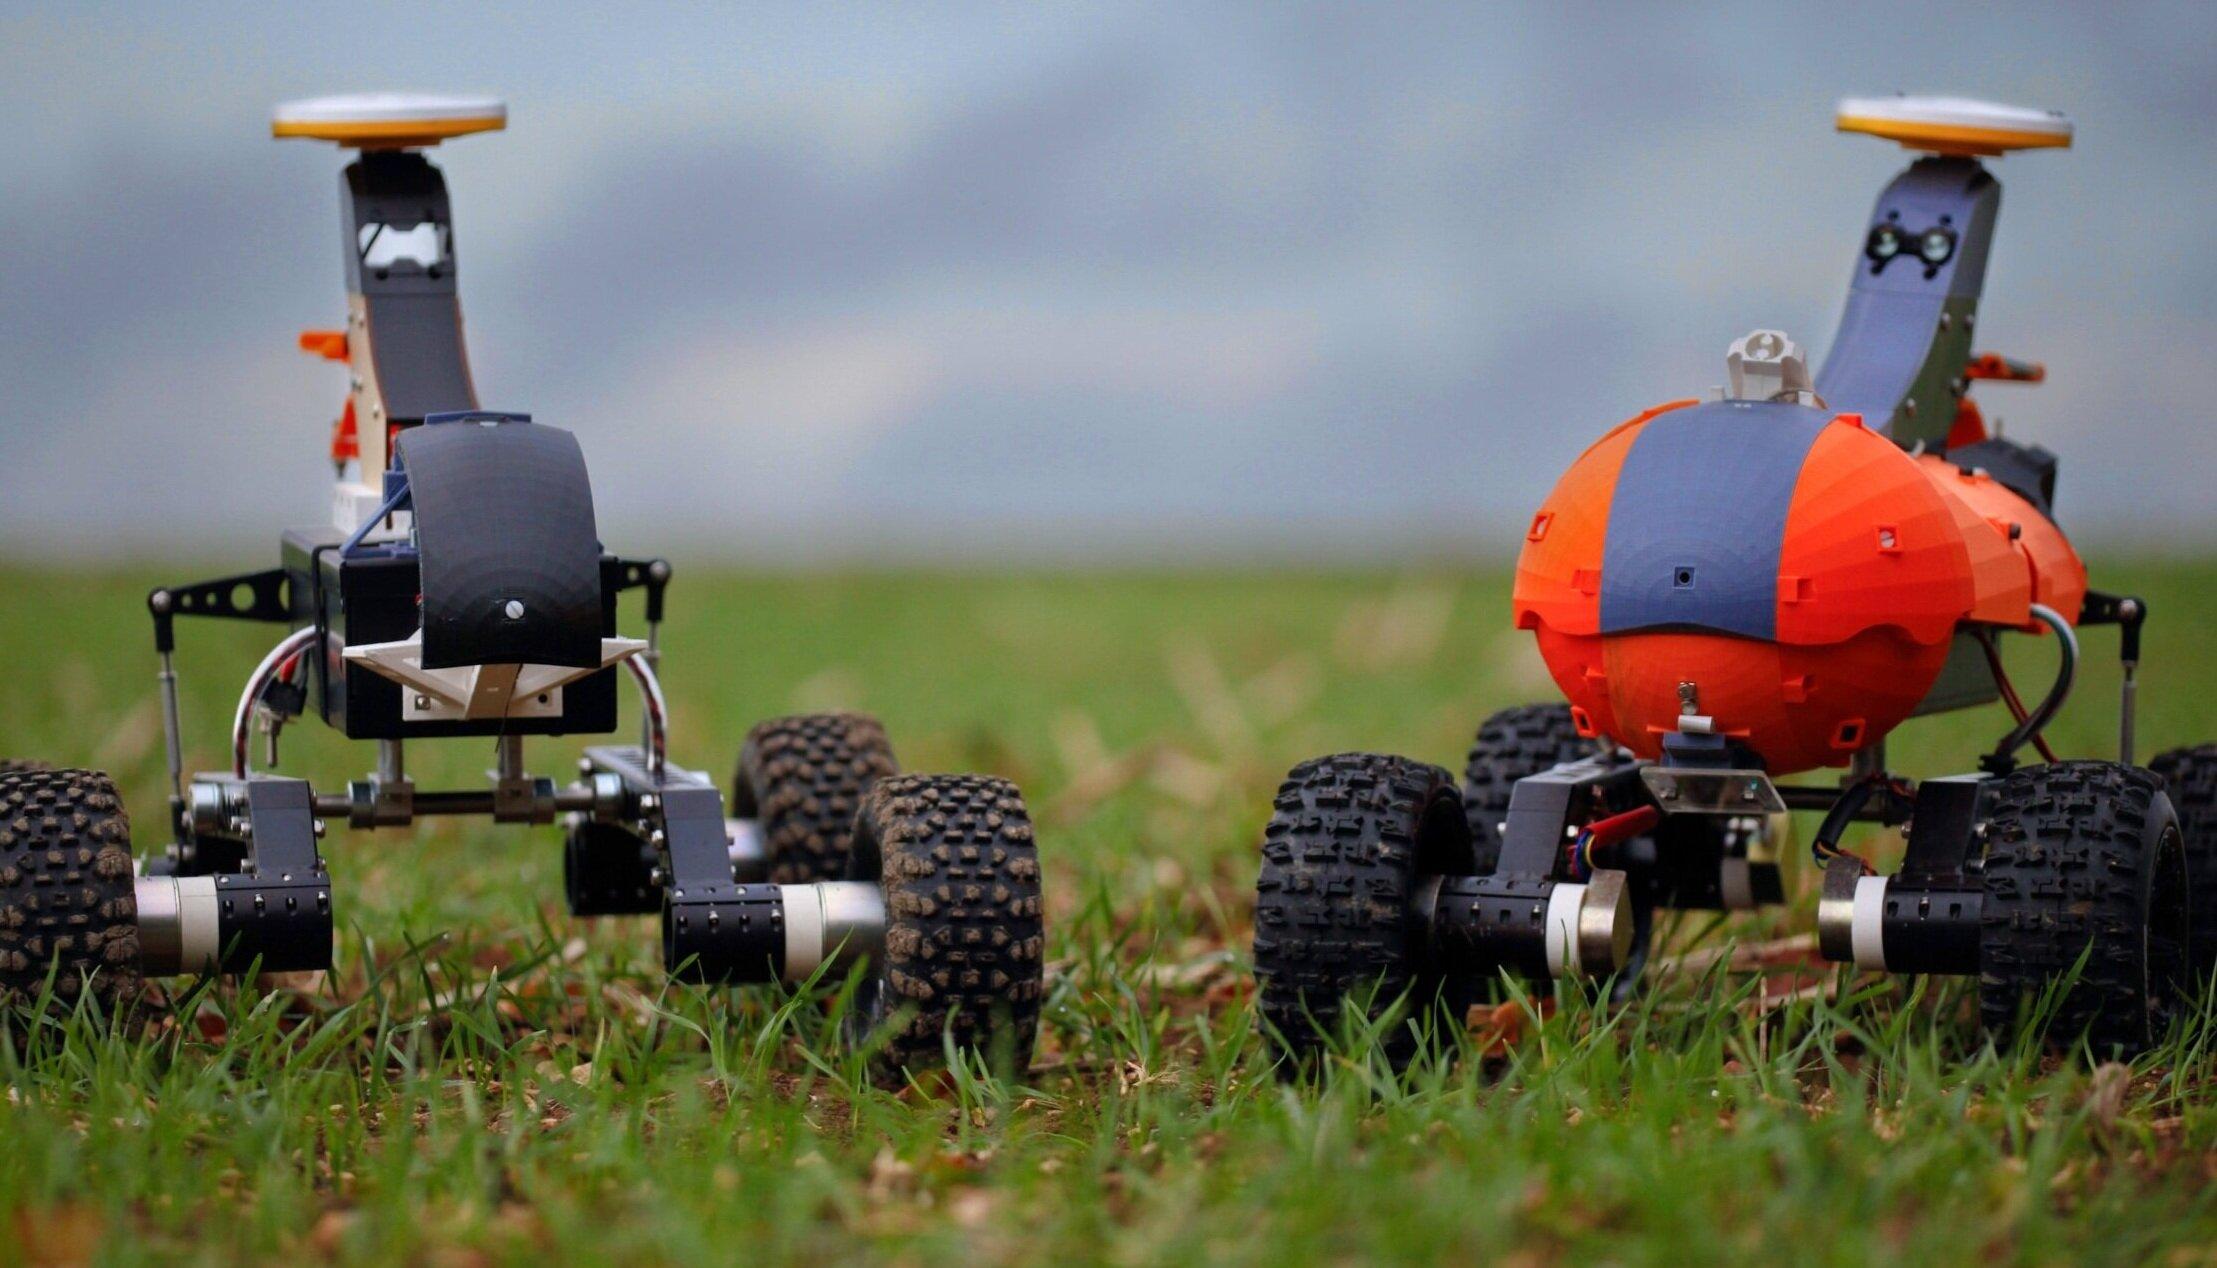 Two%2Brobots.jpg